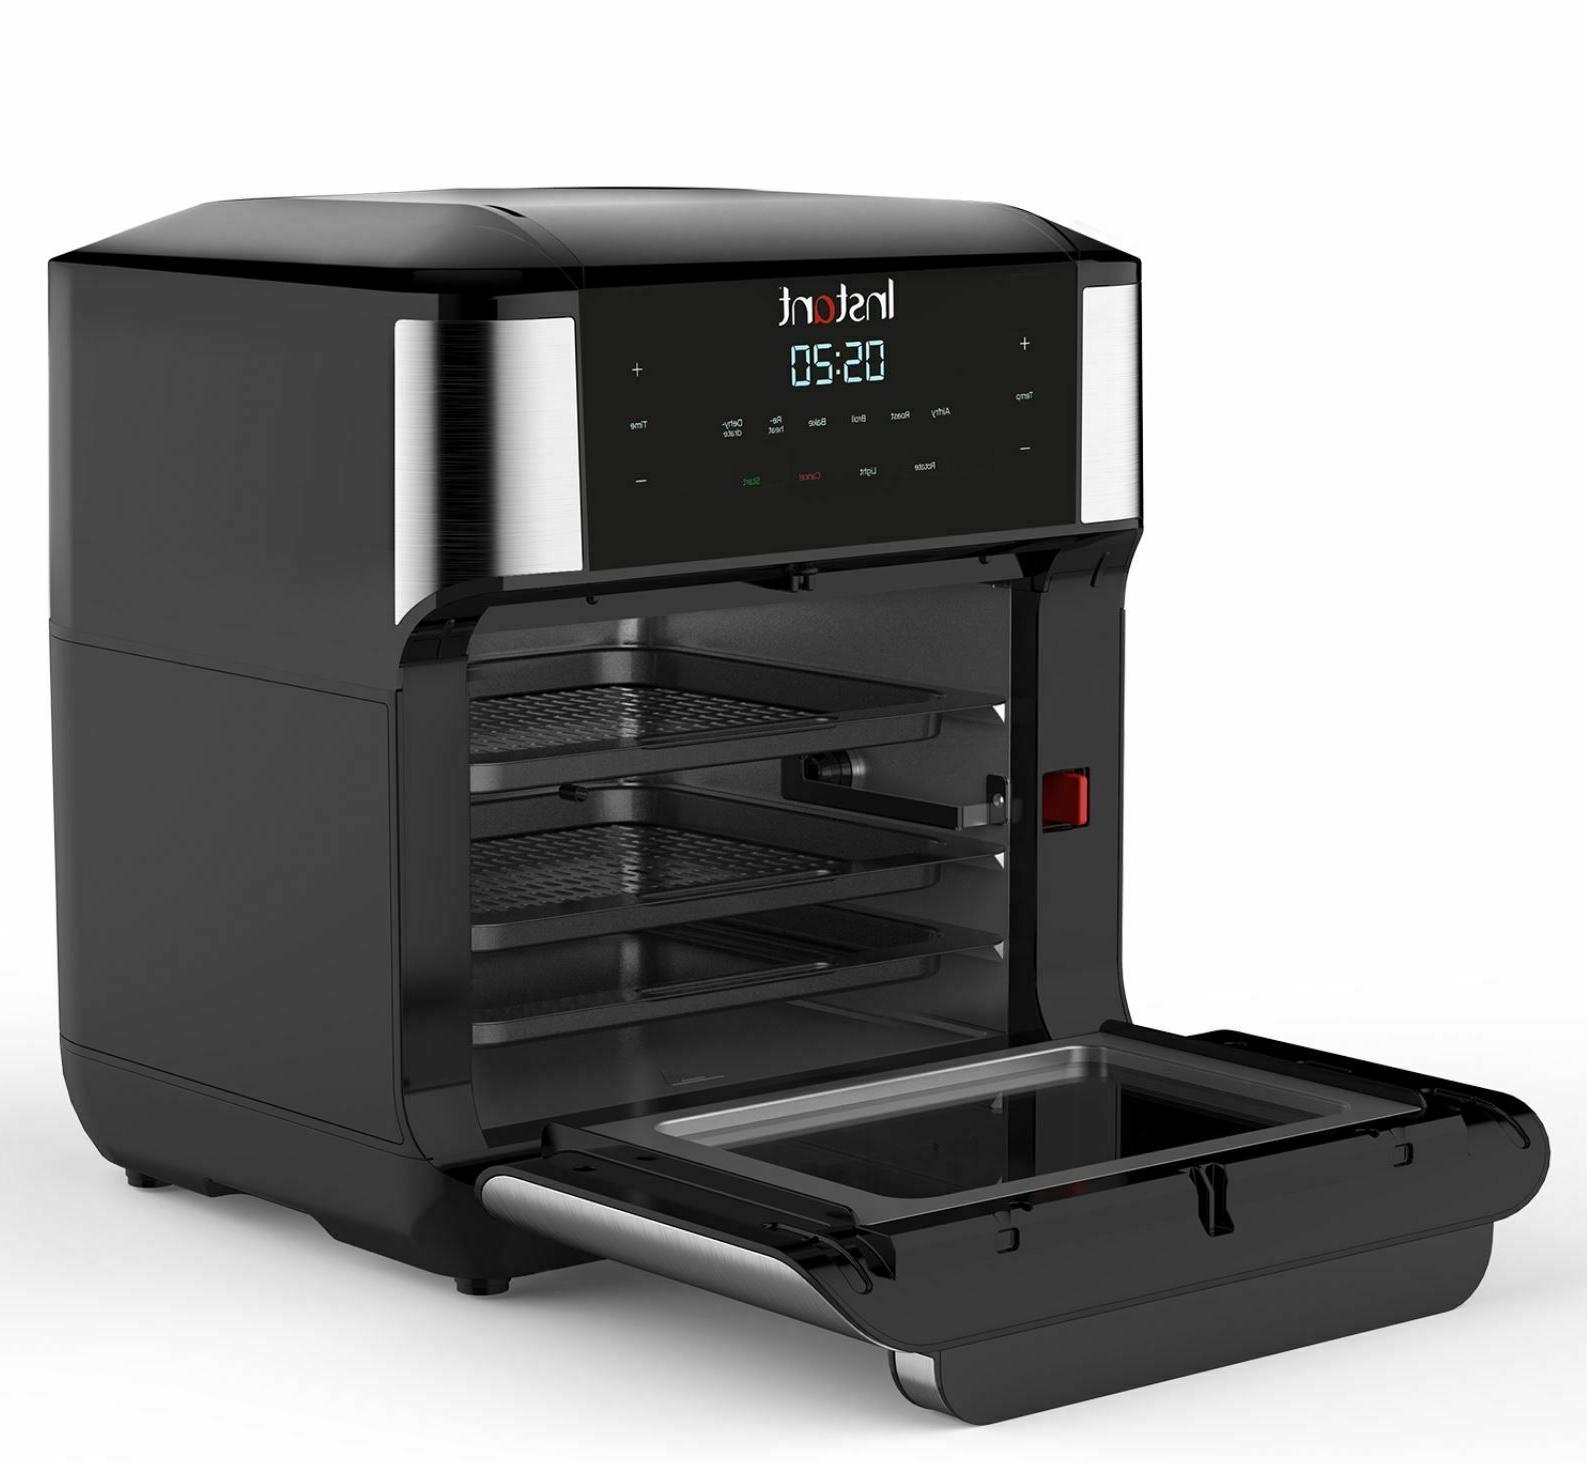 Air Fryer Oven 7-in-1 Digital 10-Quart Rotisserie Small